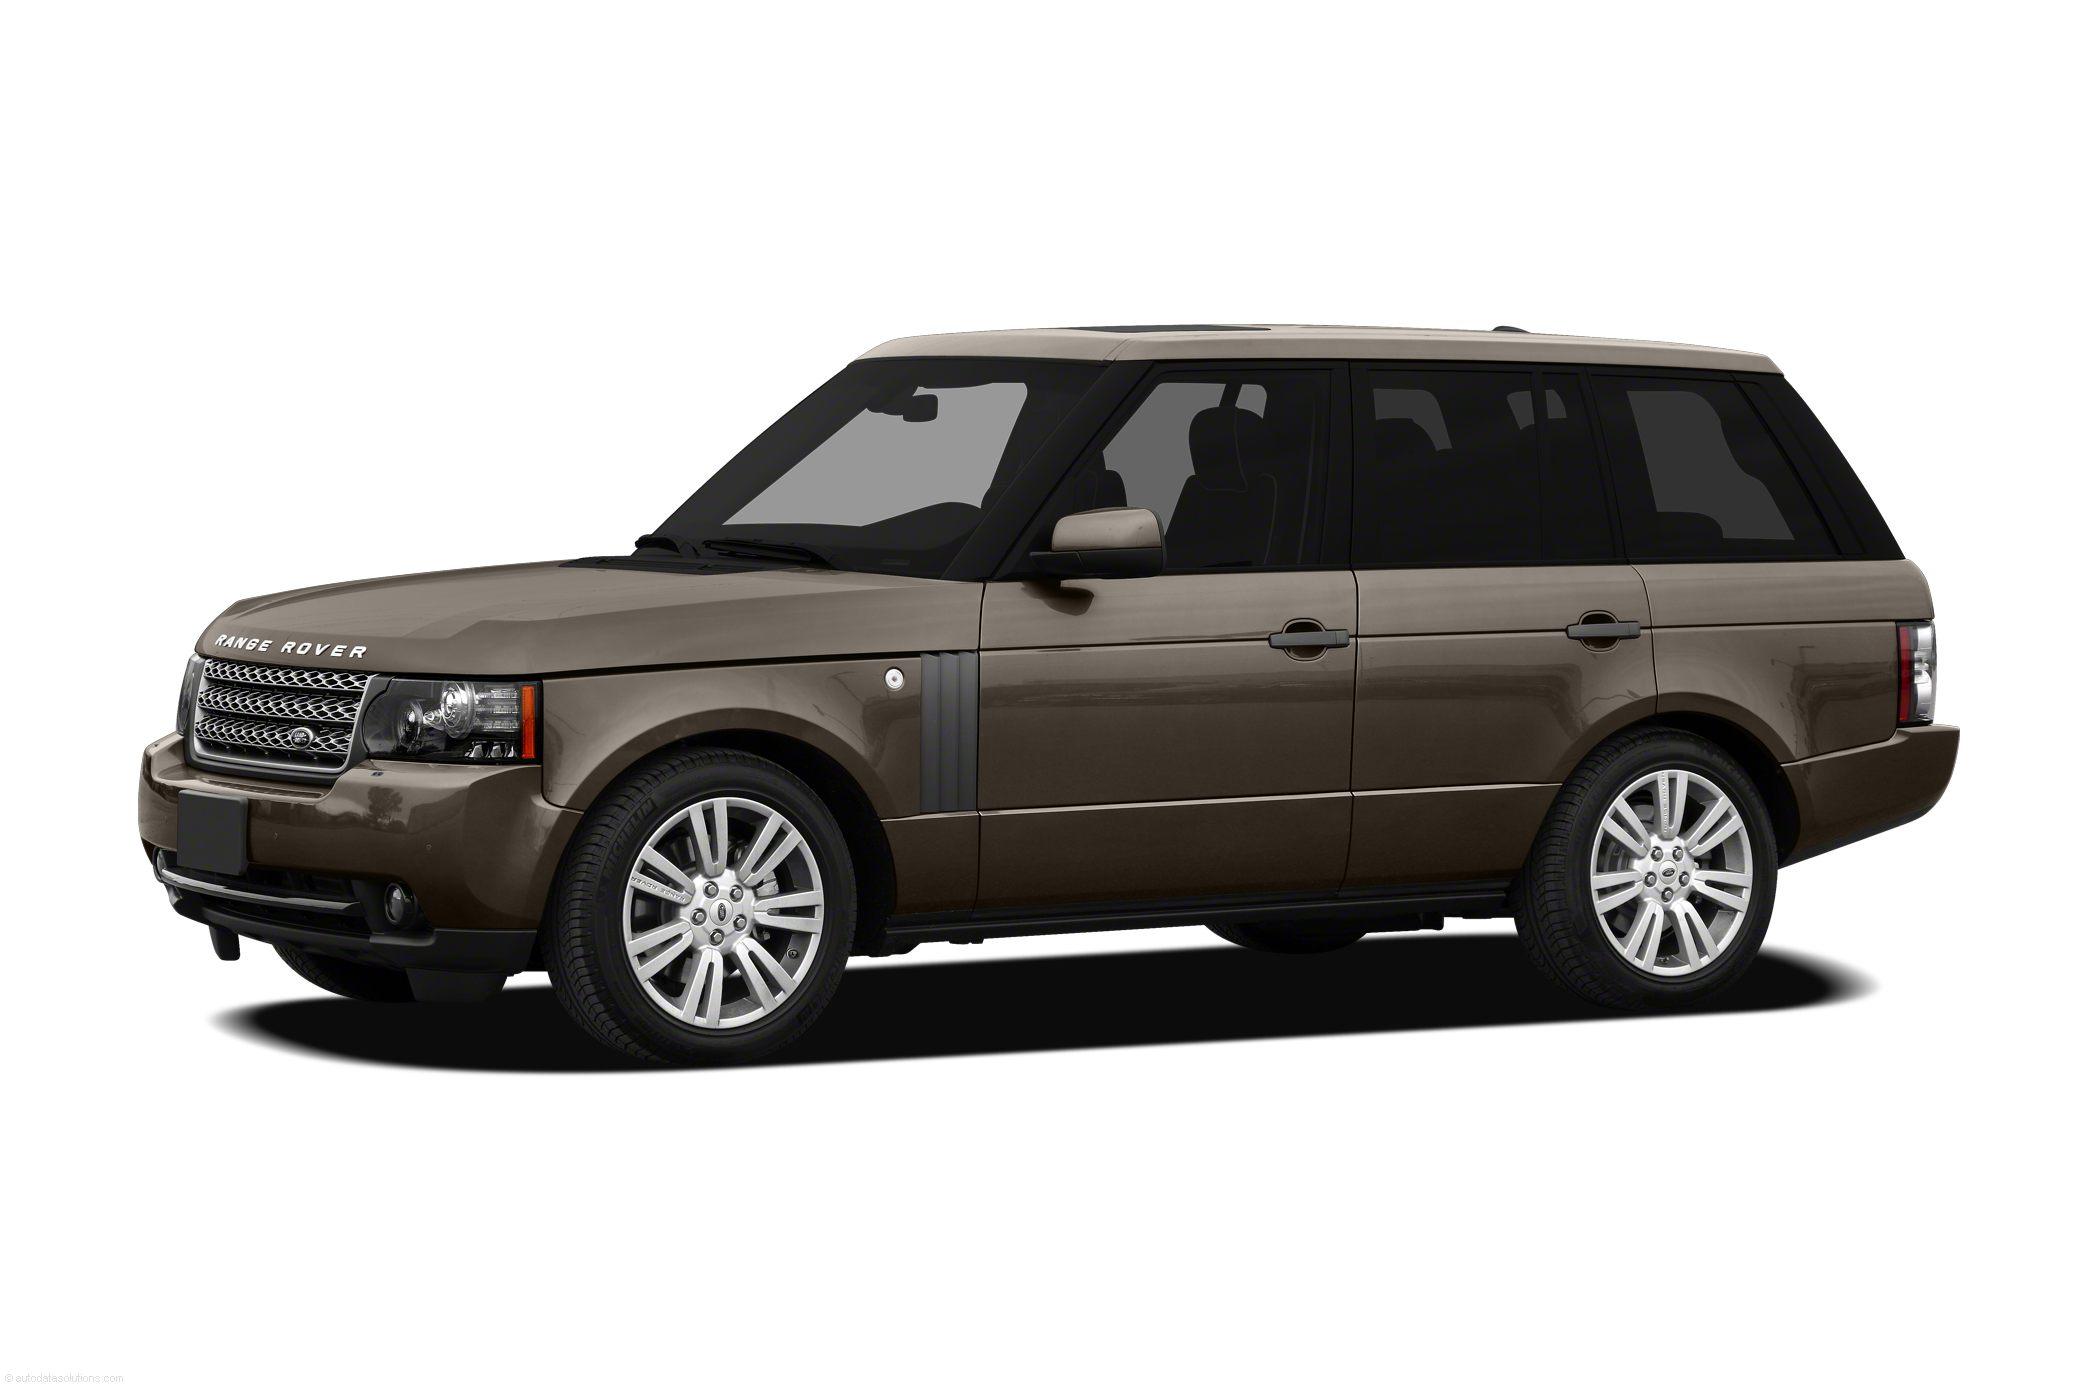 used range rover prices 35 free car wallpaper. Black Bedroom Furniture Sets. Home Design Ideas